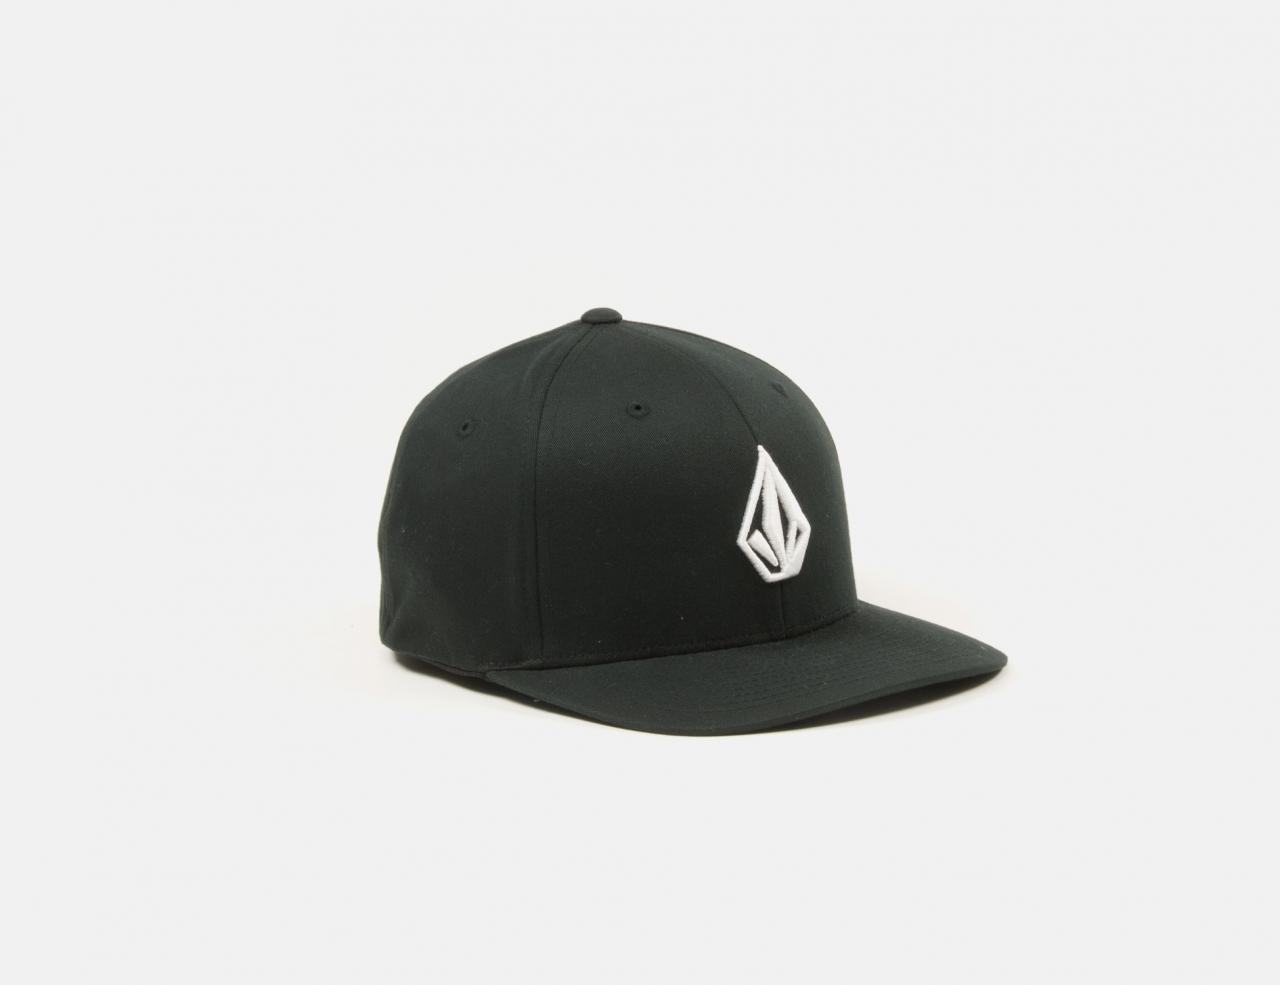 Volcom Stone Recycled Flexfit Cap - Black